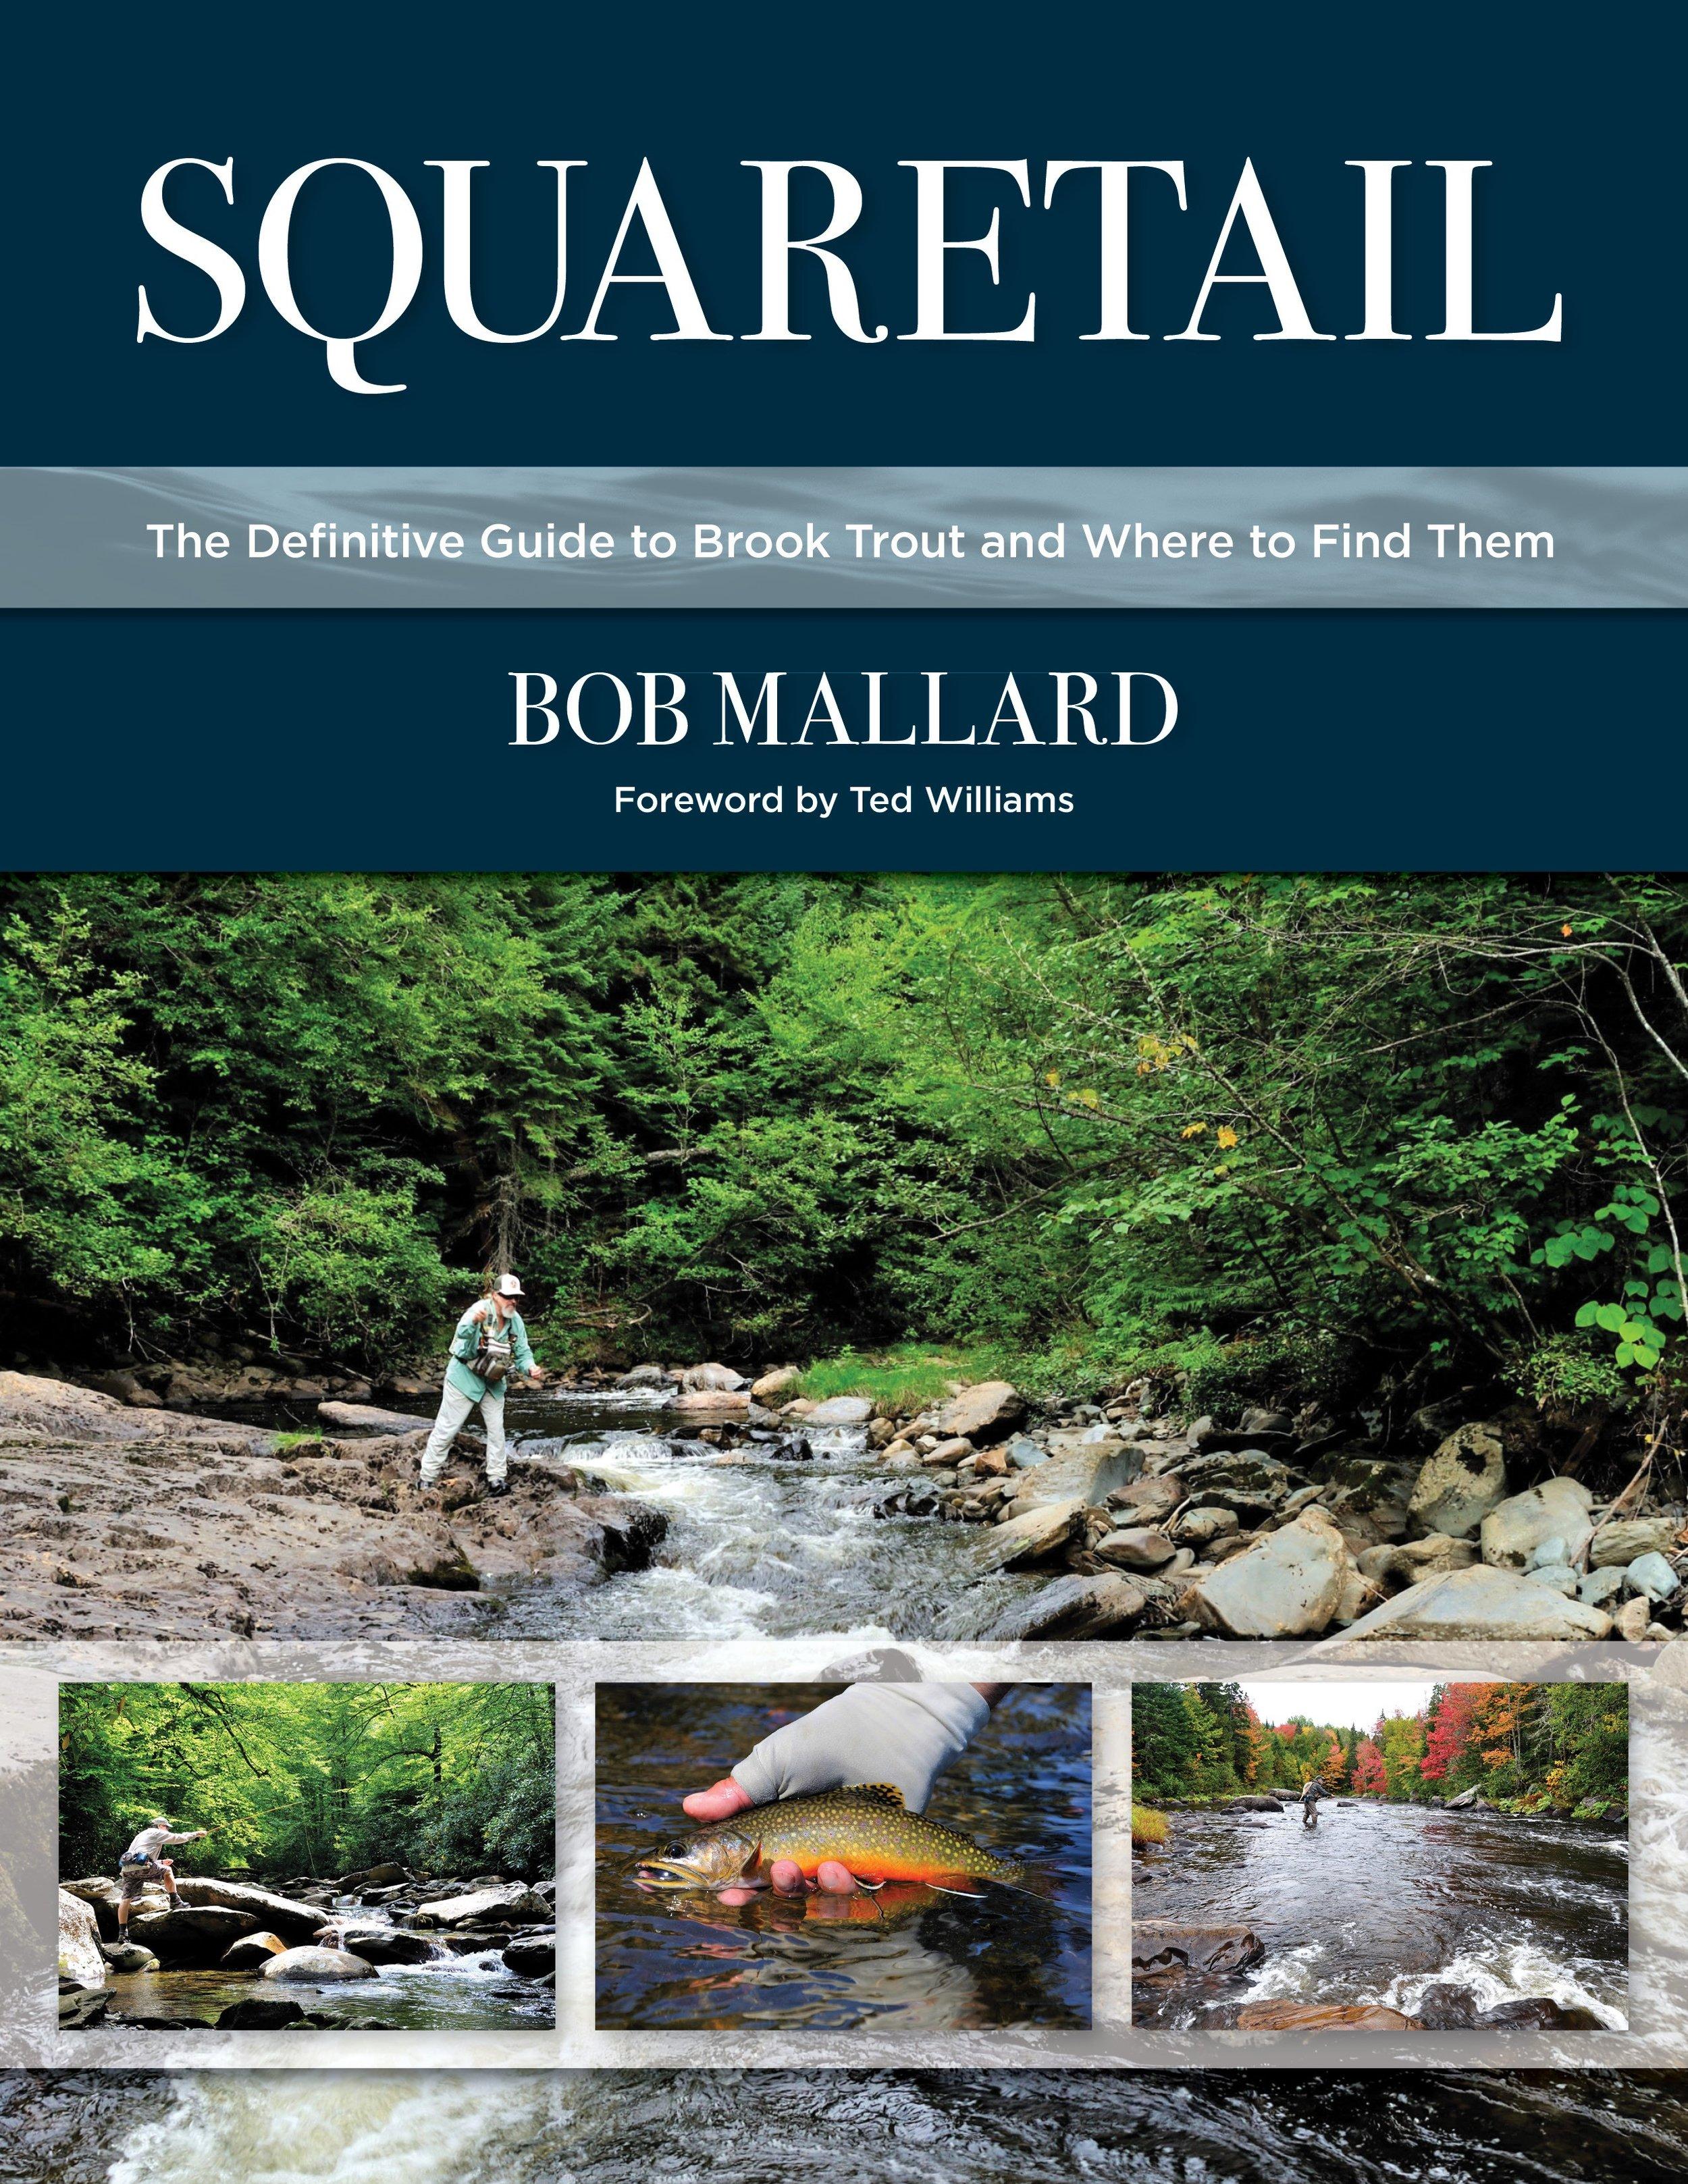 squaretail cover.jpg